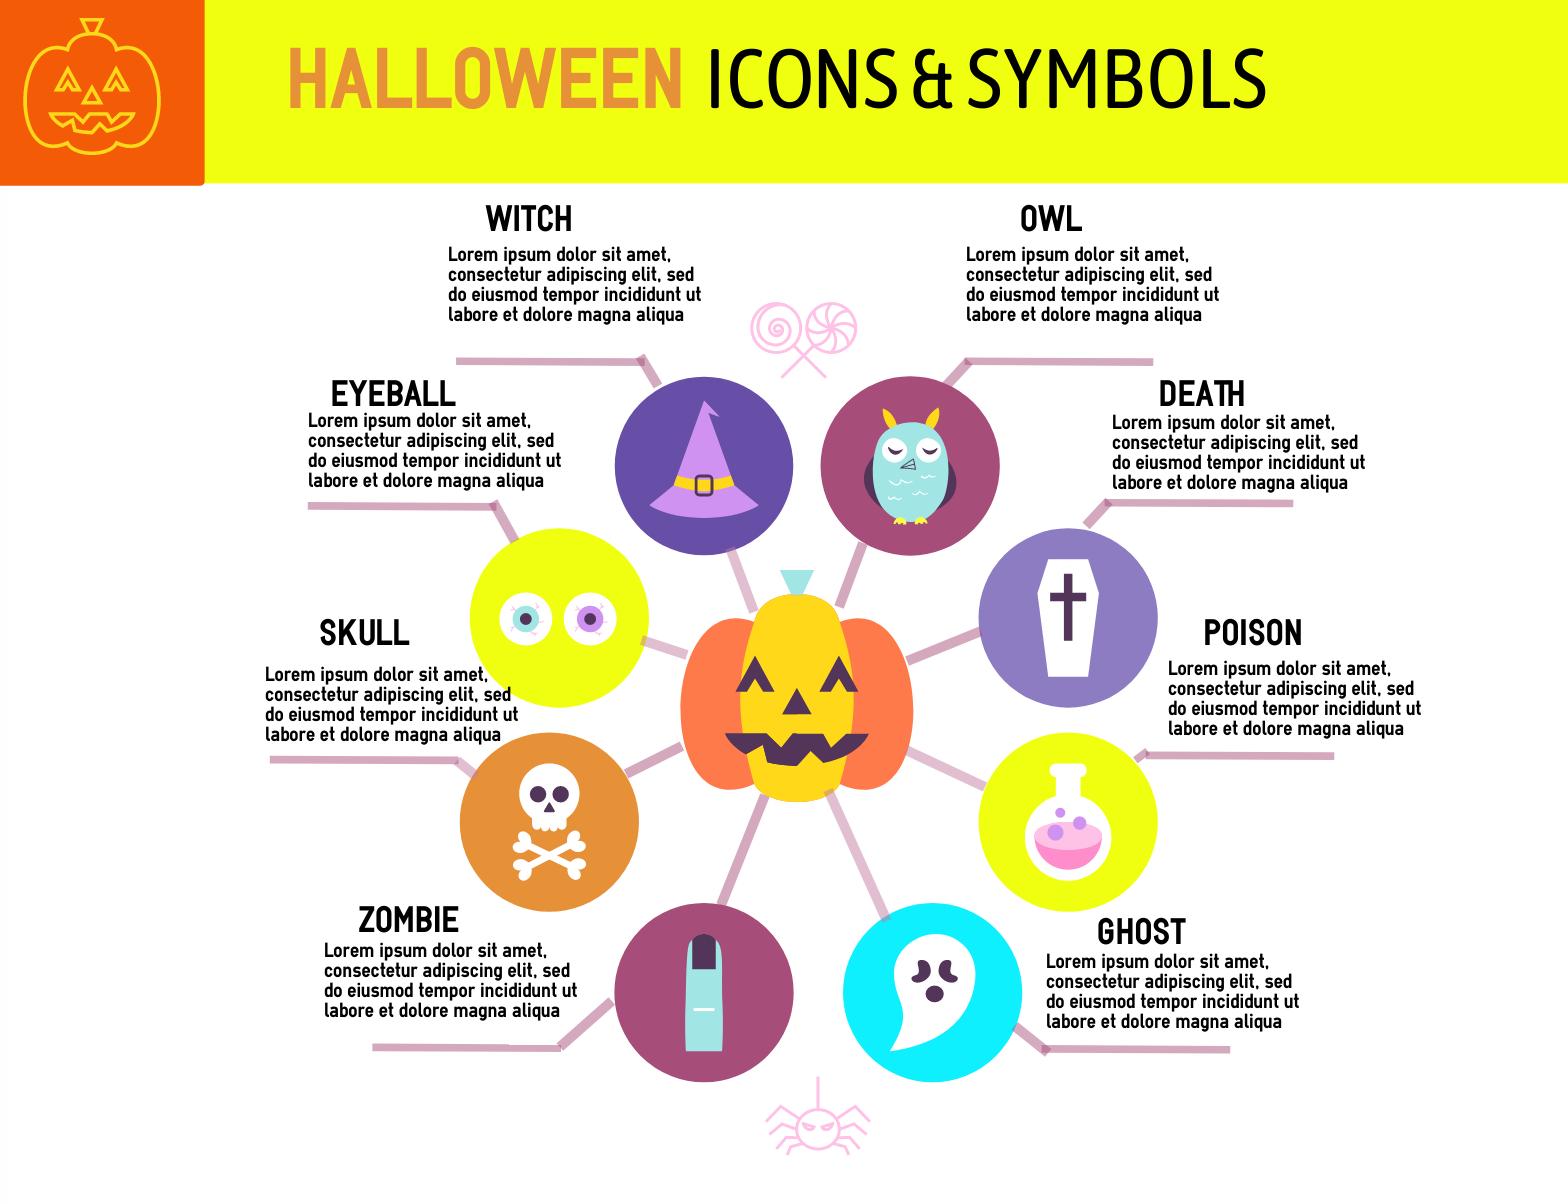 Halloween icons and symbols infographic